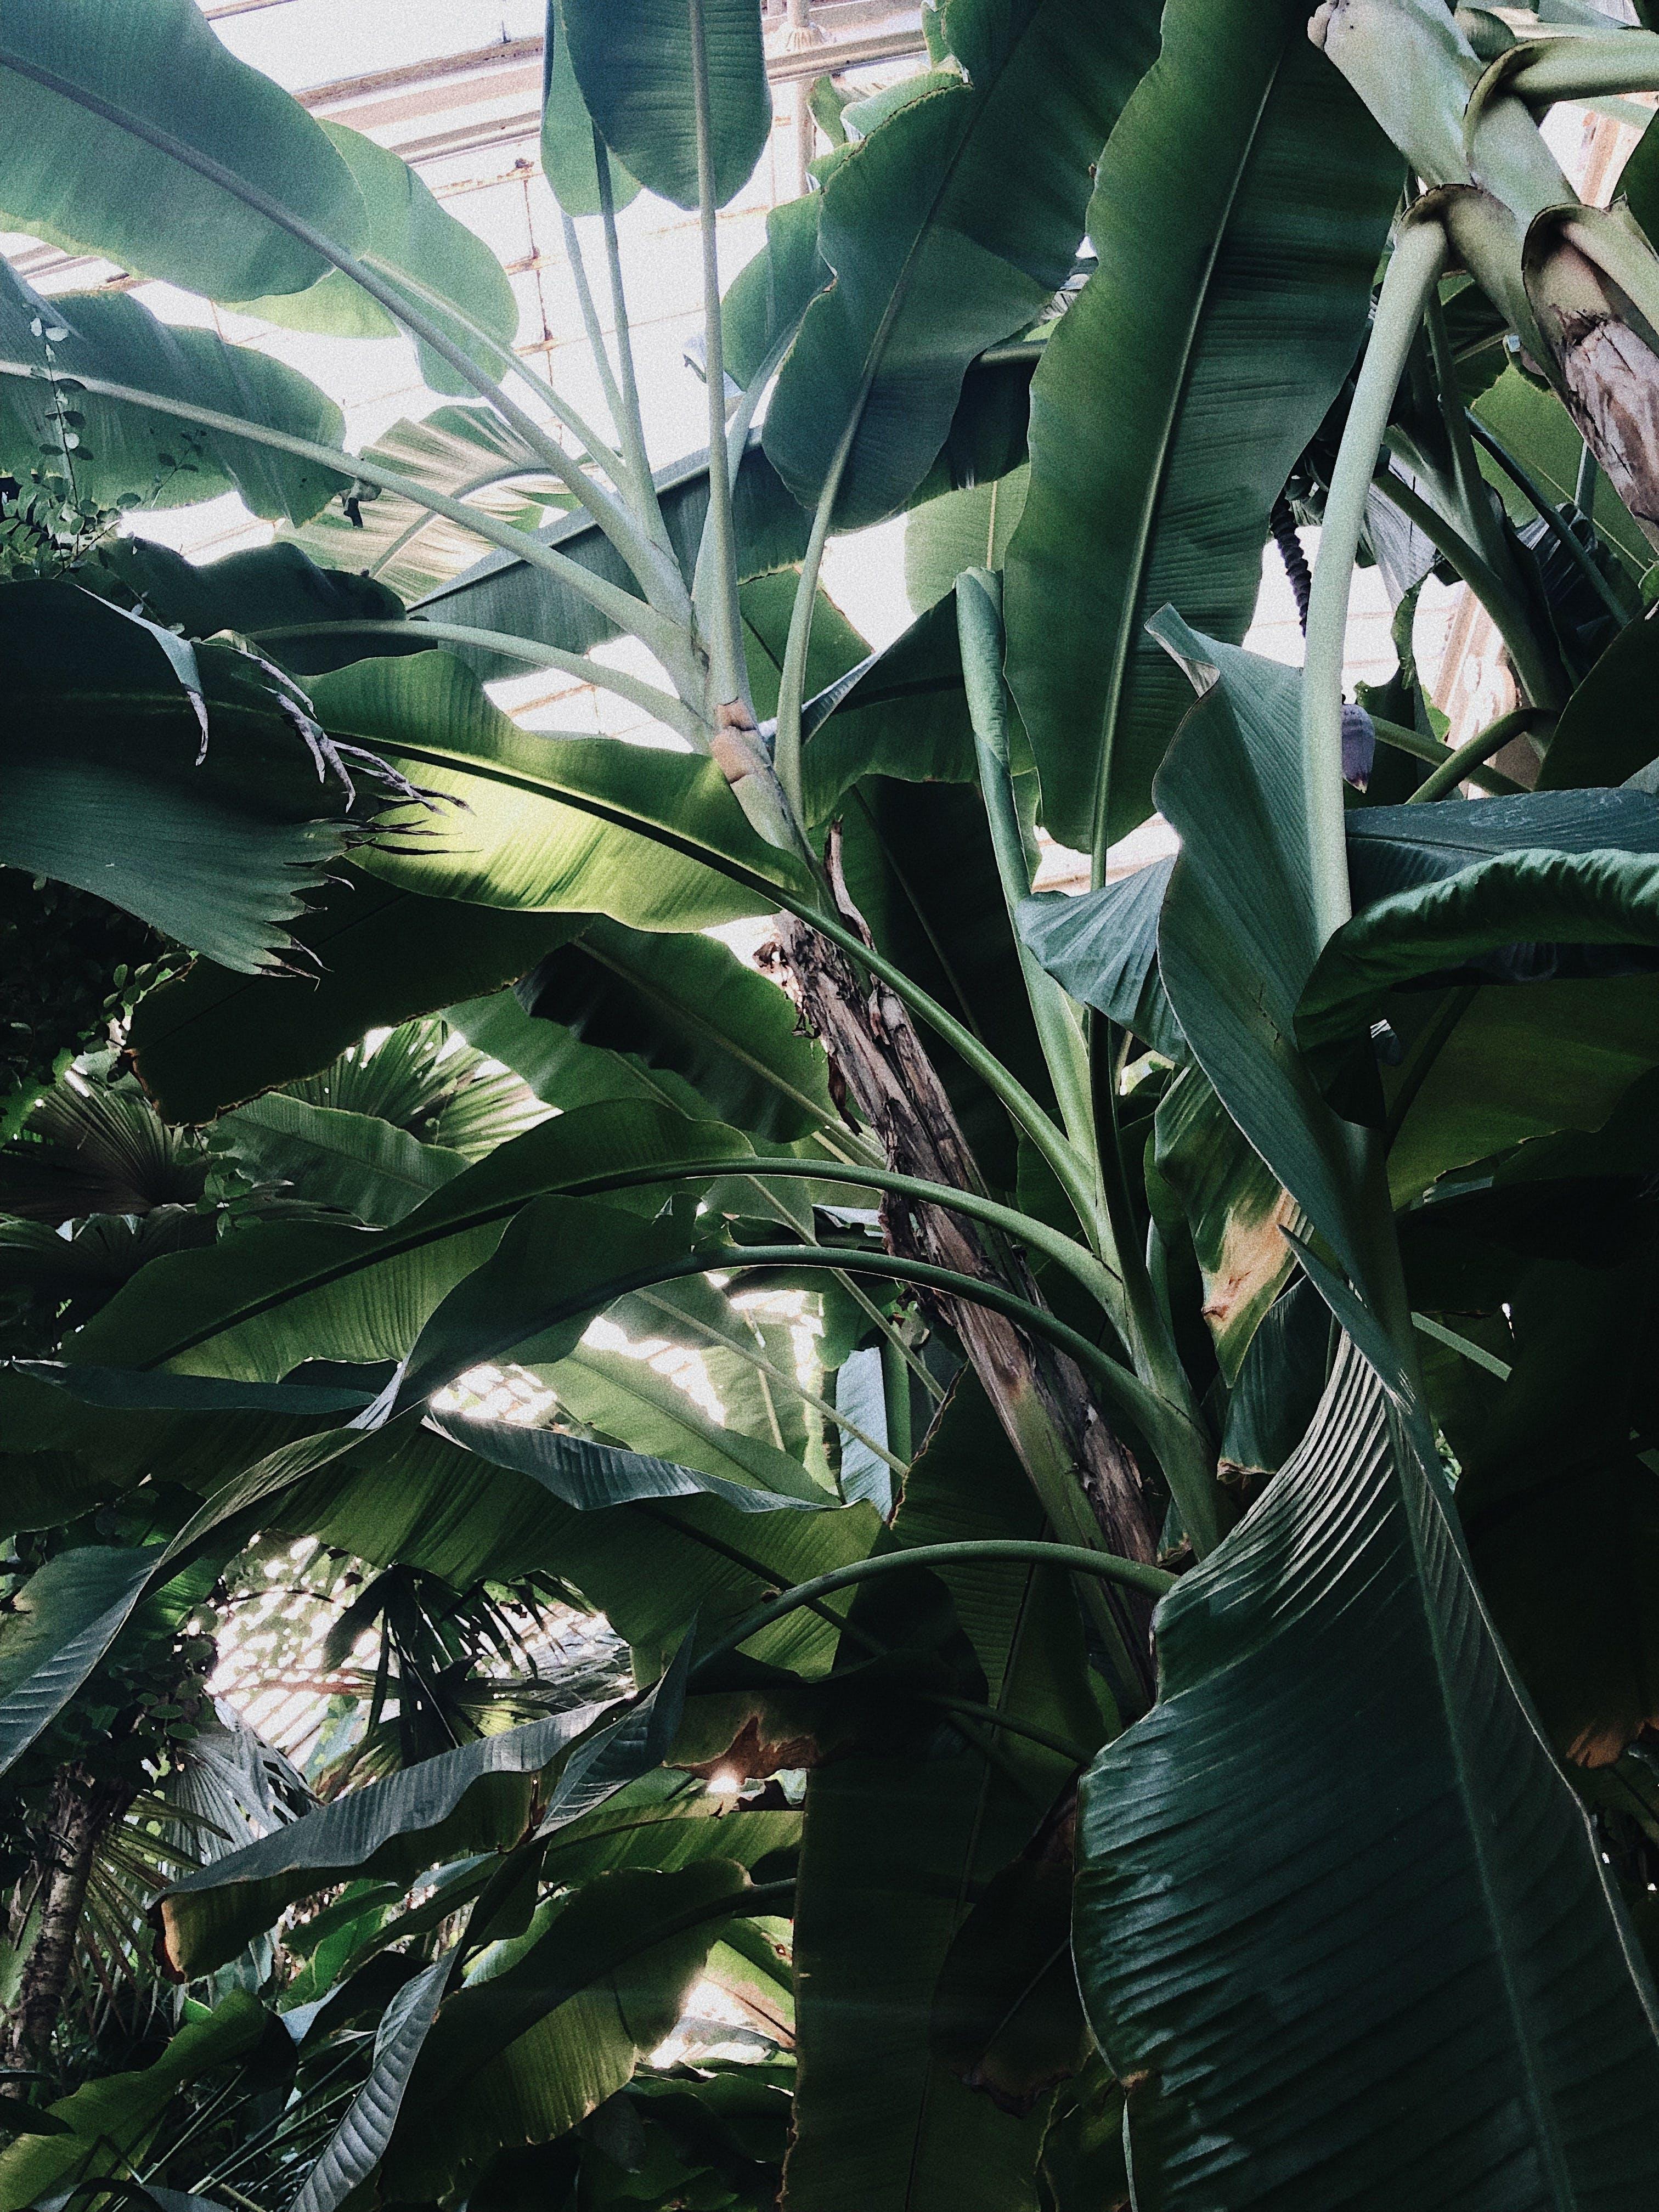 Low Angle Photo of Banana Tree